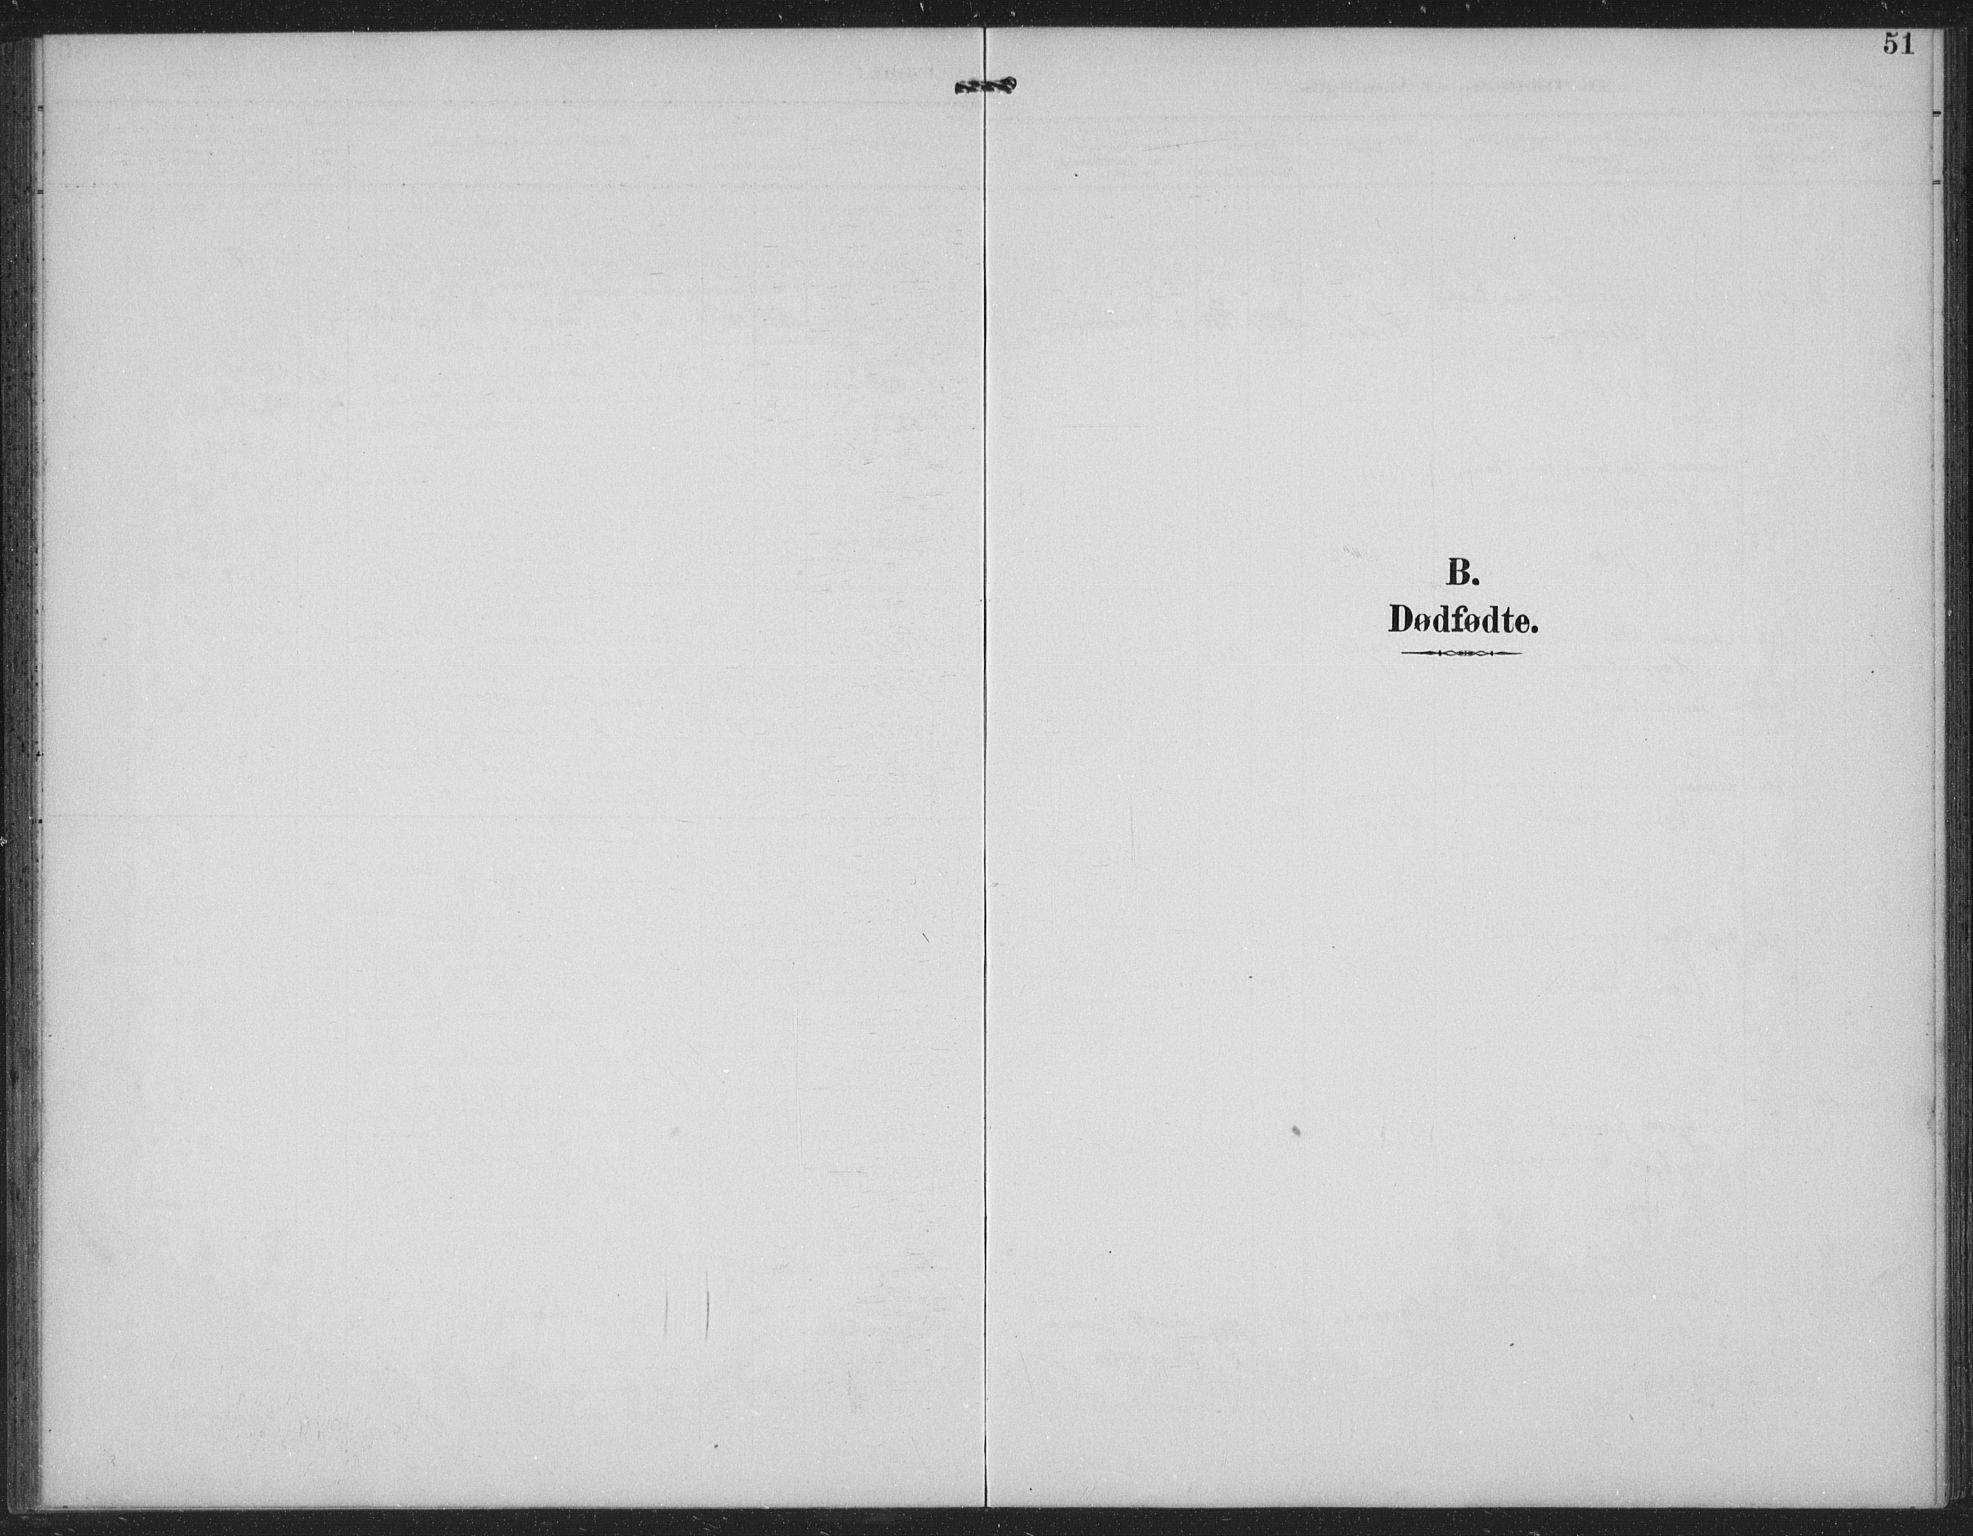 SAKO, Seljord kirkebøker, G/Gc/L0003: Klokkerbok nr. III 3, 1887-1926, s. 51